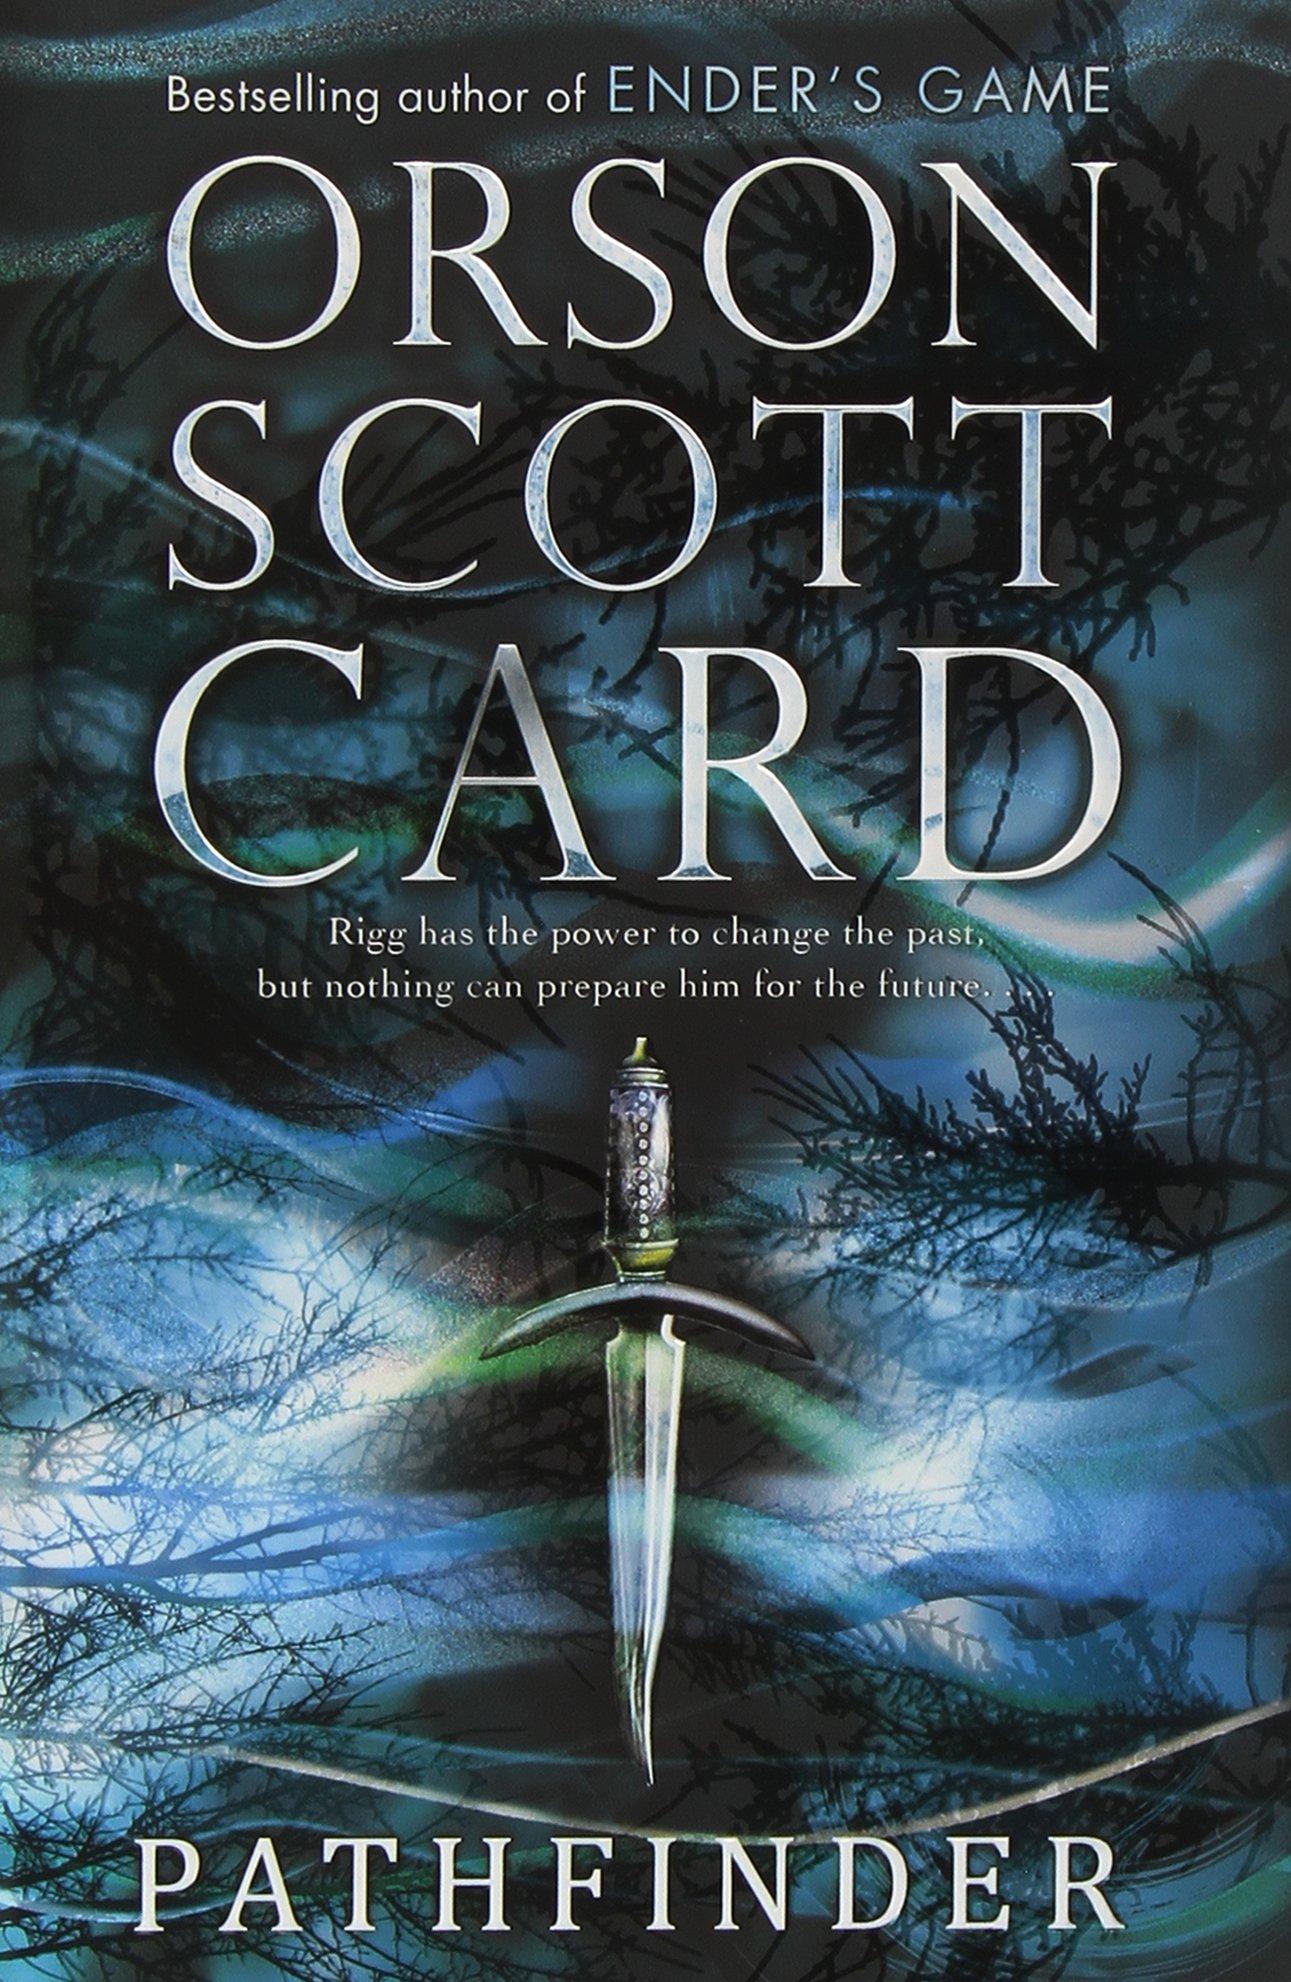 Pathfinder Trilogy: Pathfinder; Ruins; Visitors: Orson Scott Card ...